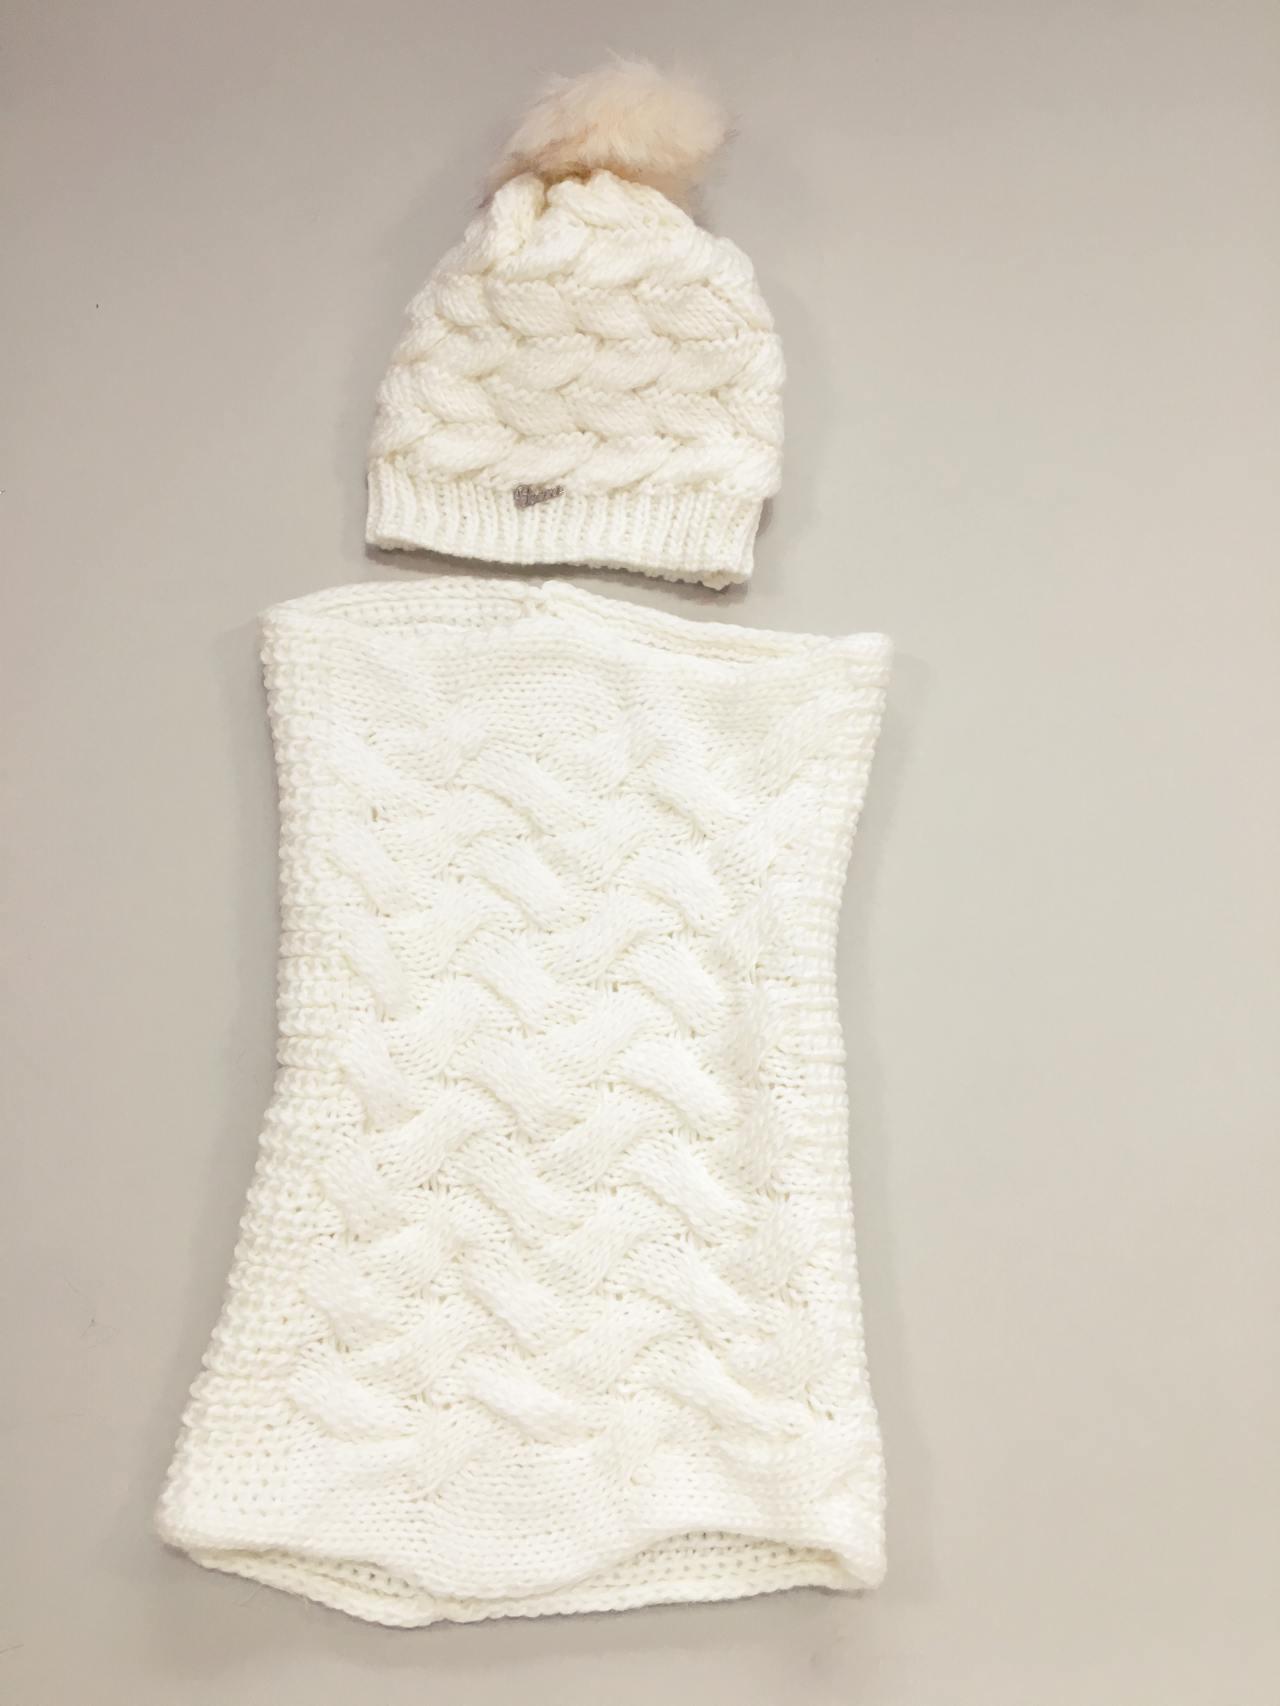 Pletený komplet čepice a nákrčník bílý 03